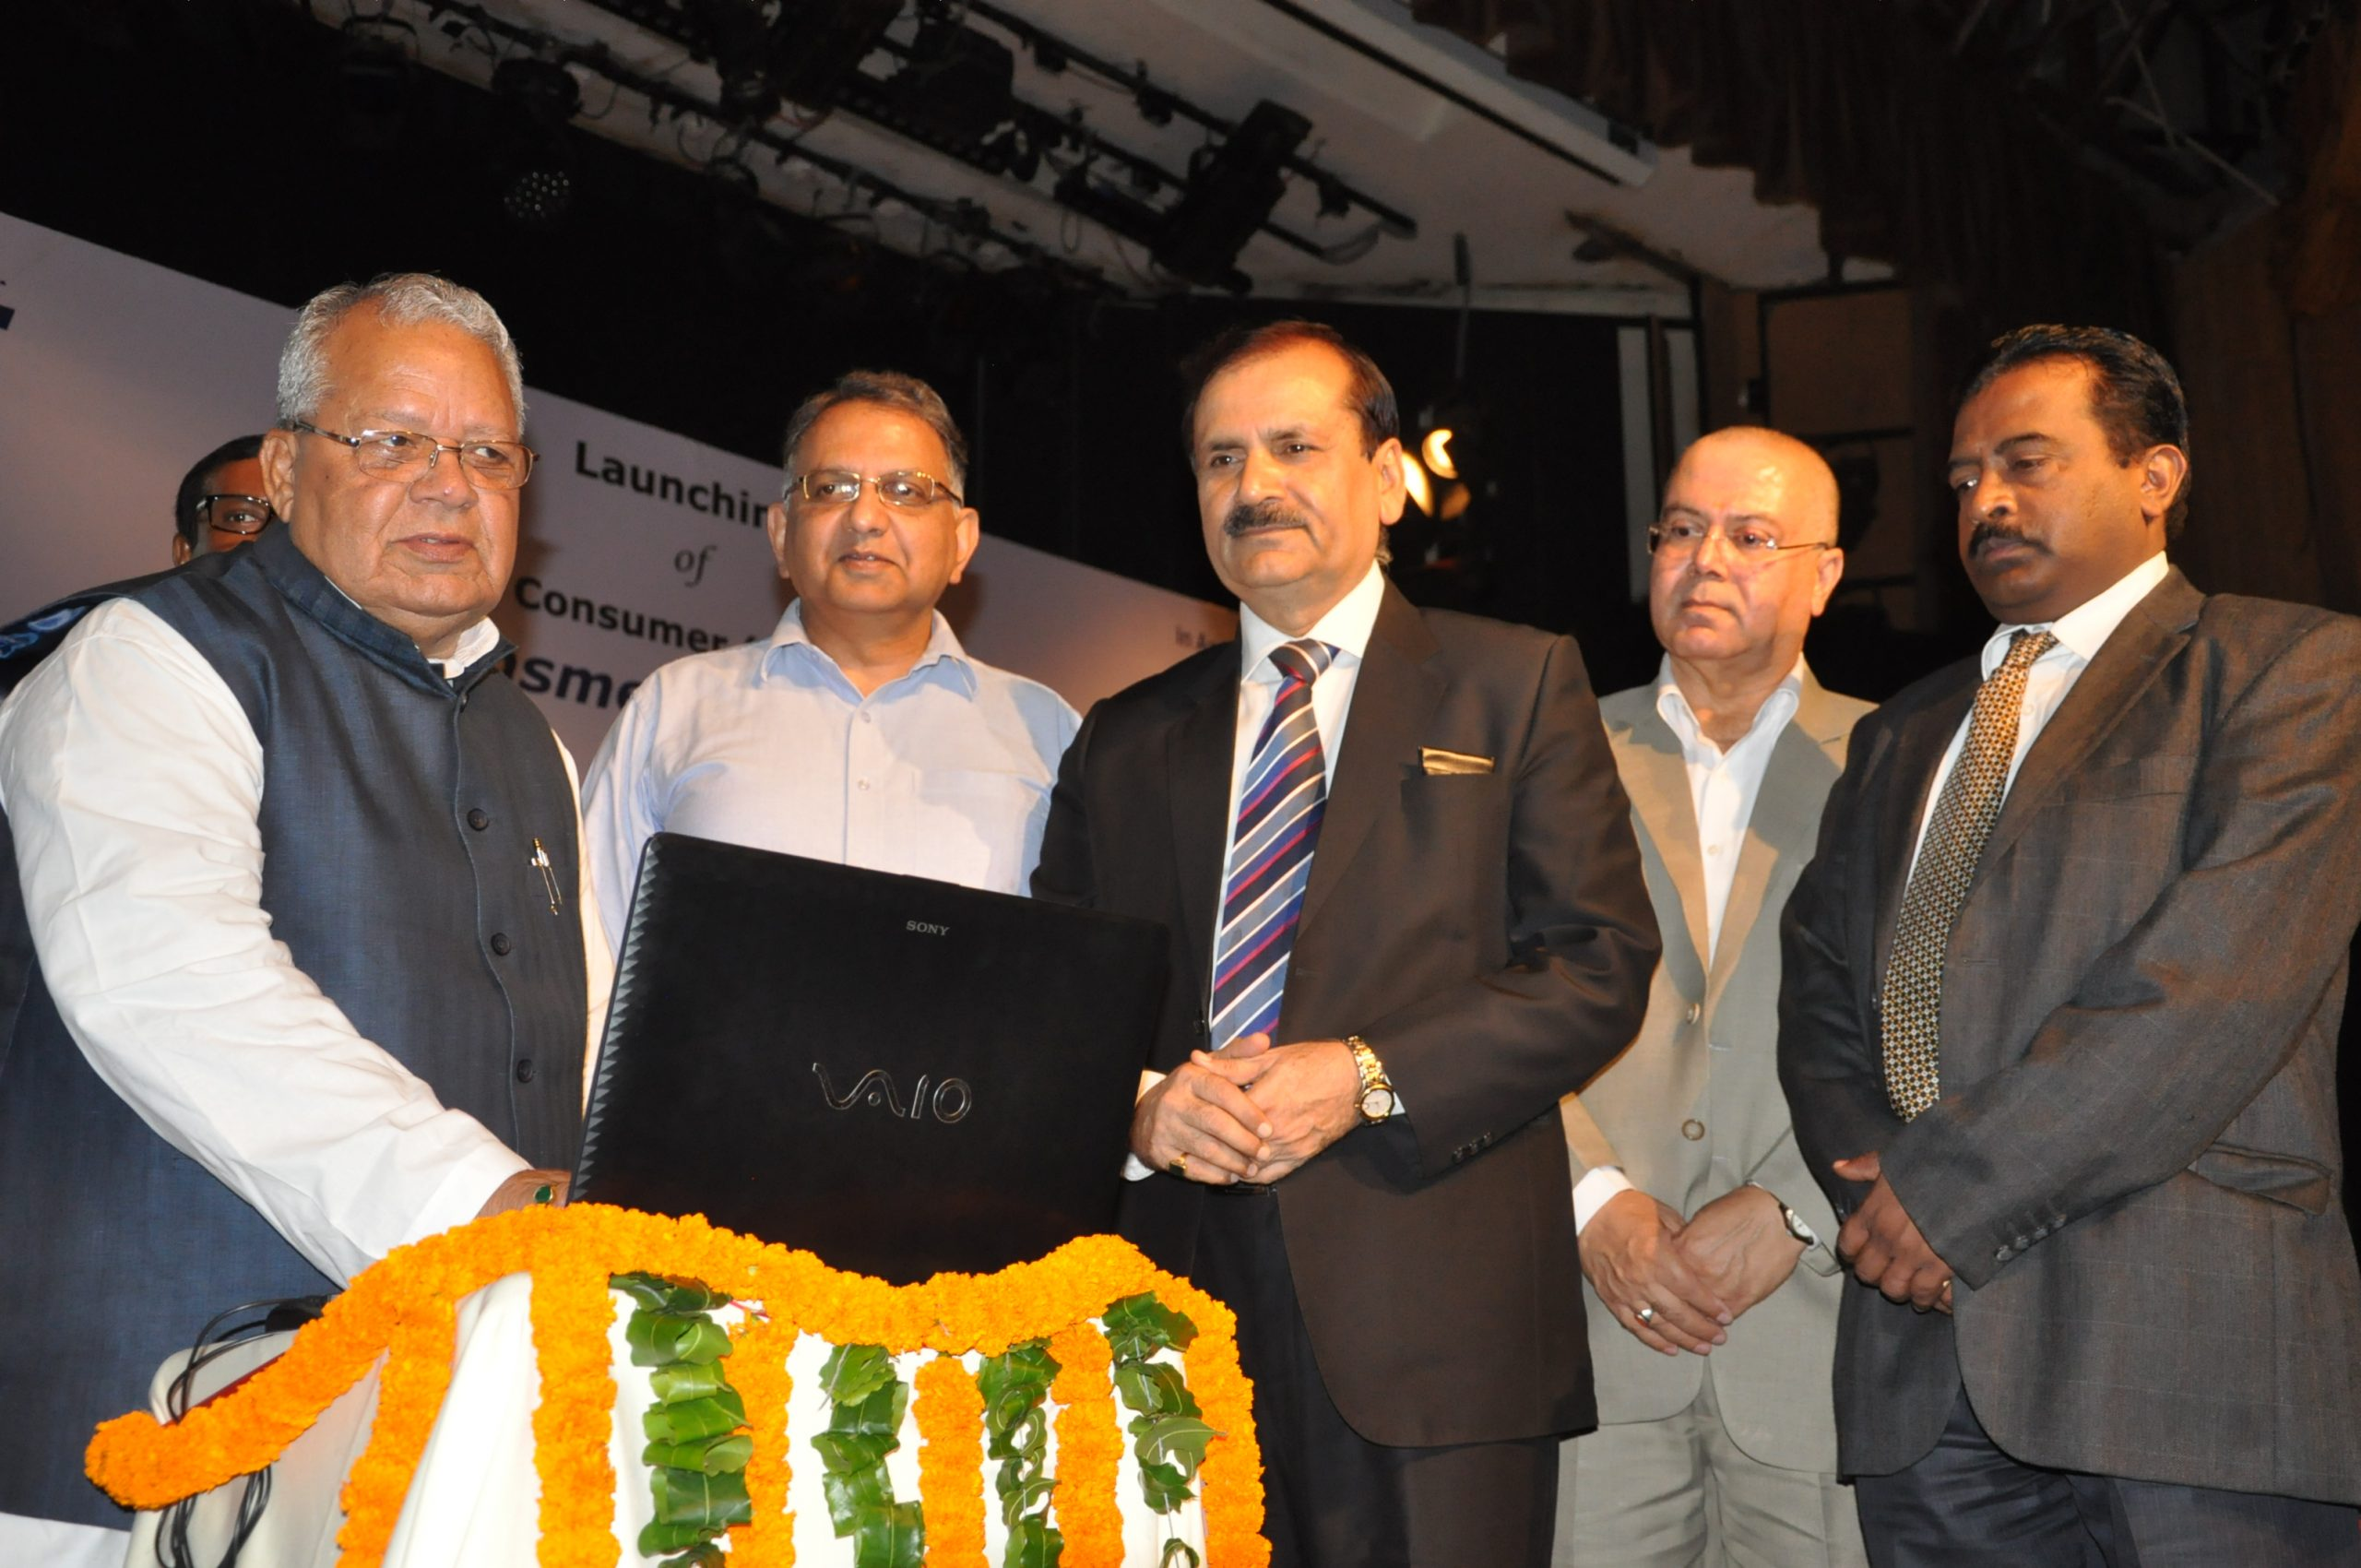 Shri Kalraj Mishra, Hon'ble Minister, MSME launches NSICs B2C Web Portal www.msmeshopping .com for MSMEs.